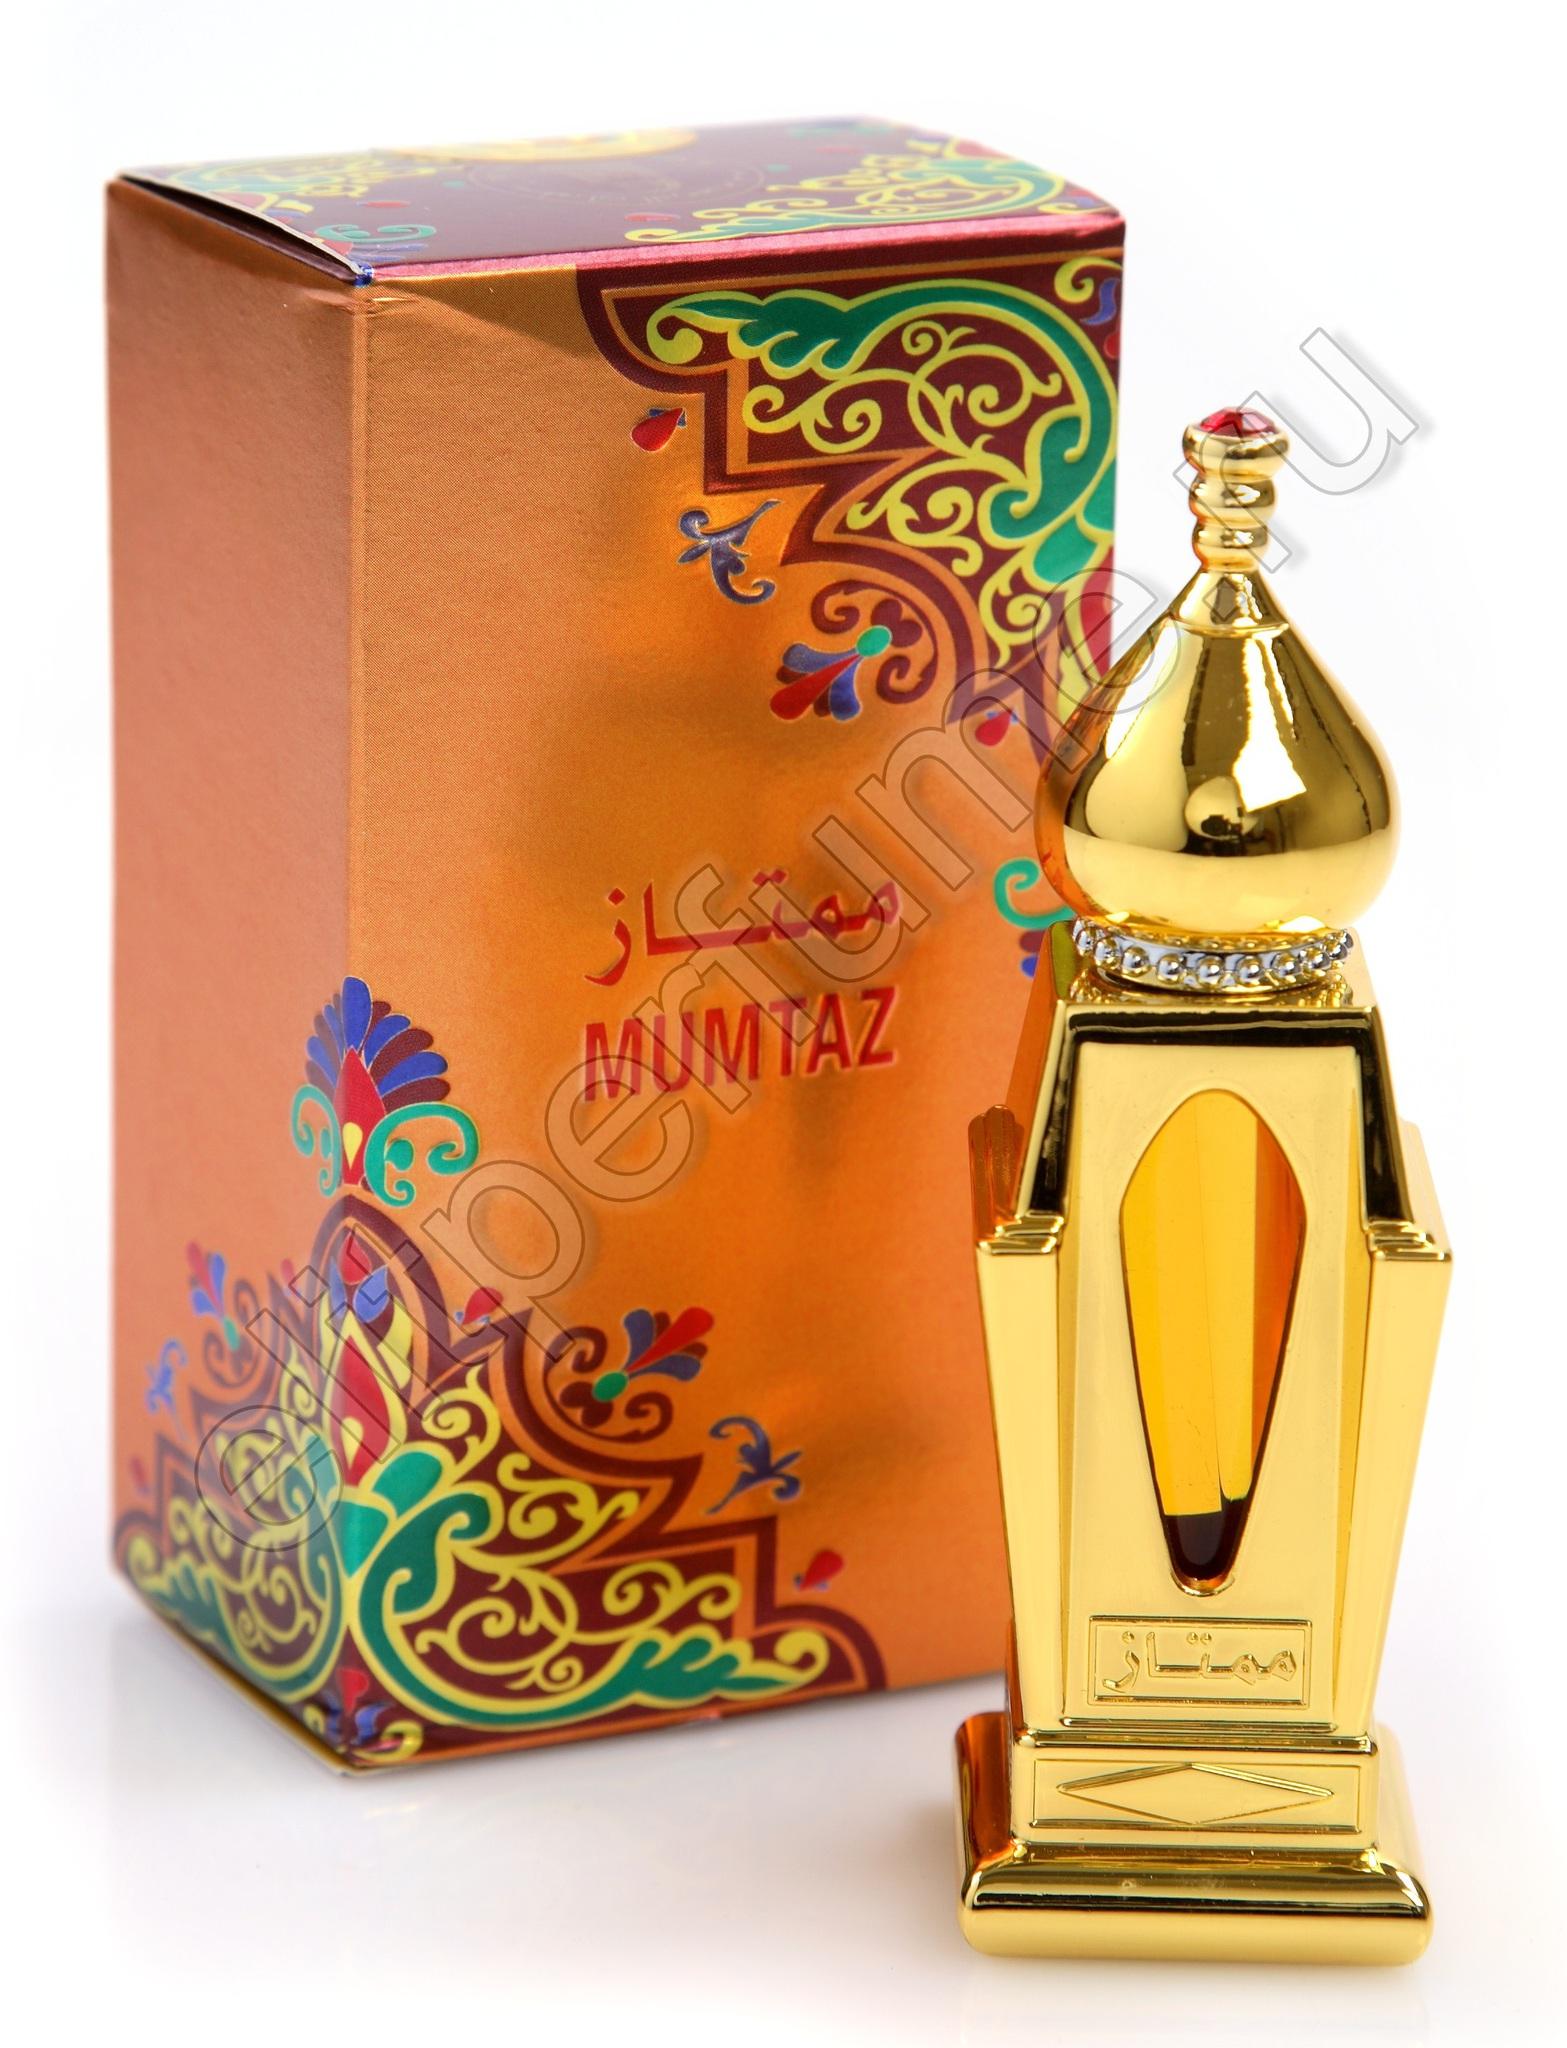 Пробники для духов Мумтаз Mumtaz 1 мл арабские масляные духи от Аль Харамайн Al Haramin Perfumes